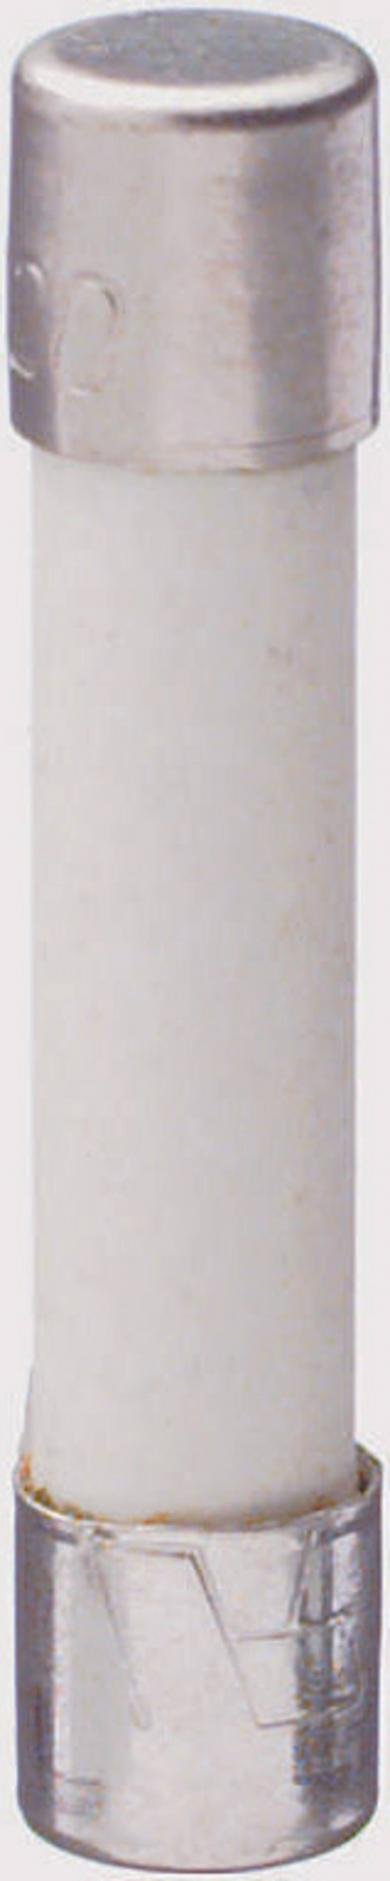 Siguranţă 6,4 x 31,8 mm ultrarapidă -FF- Eska tip GBB, 250 V/AC, 125 V/DC, 6 A